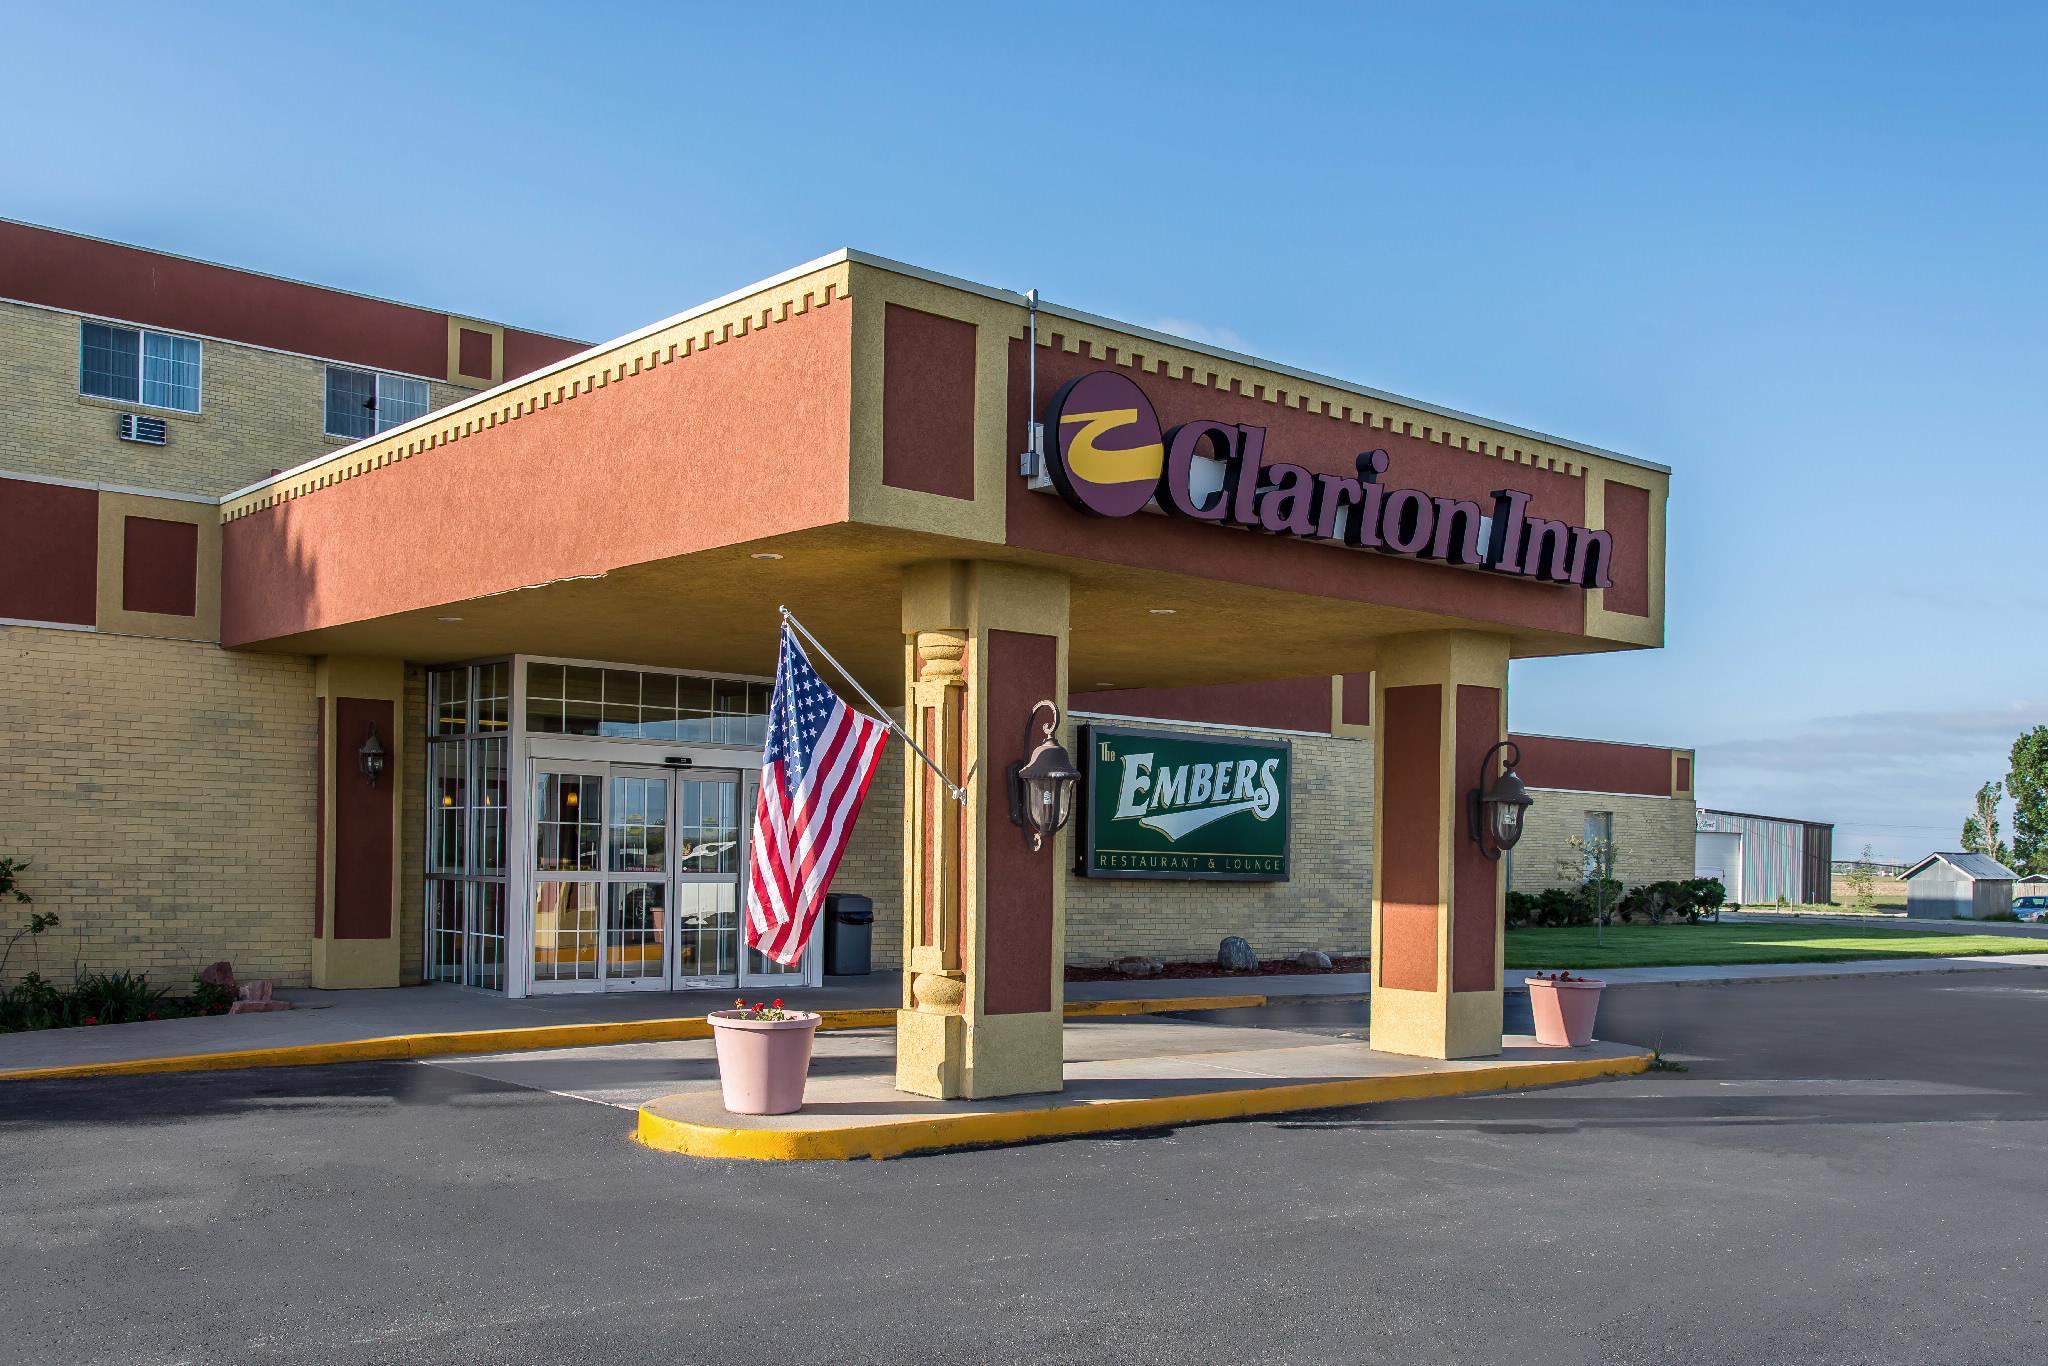 Clarion Inn, Fort Morgan CO